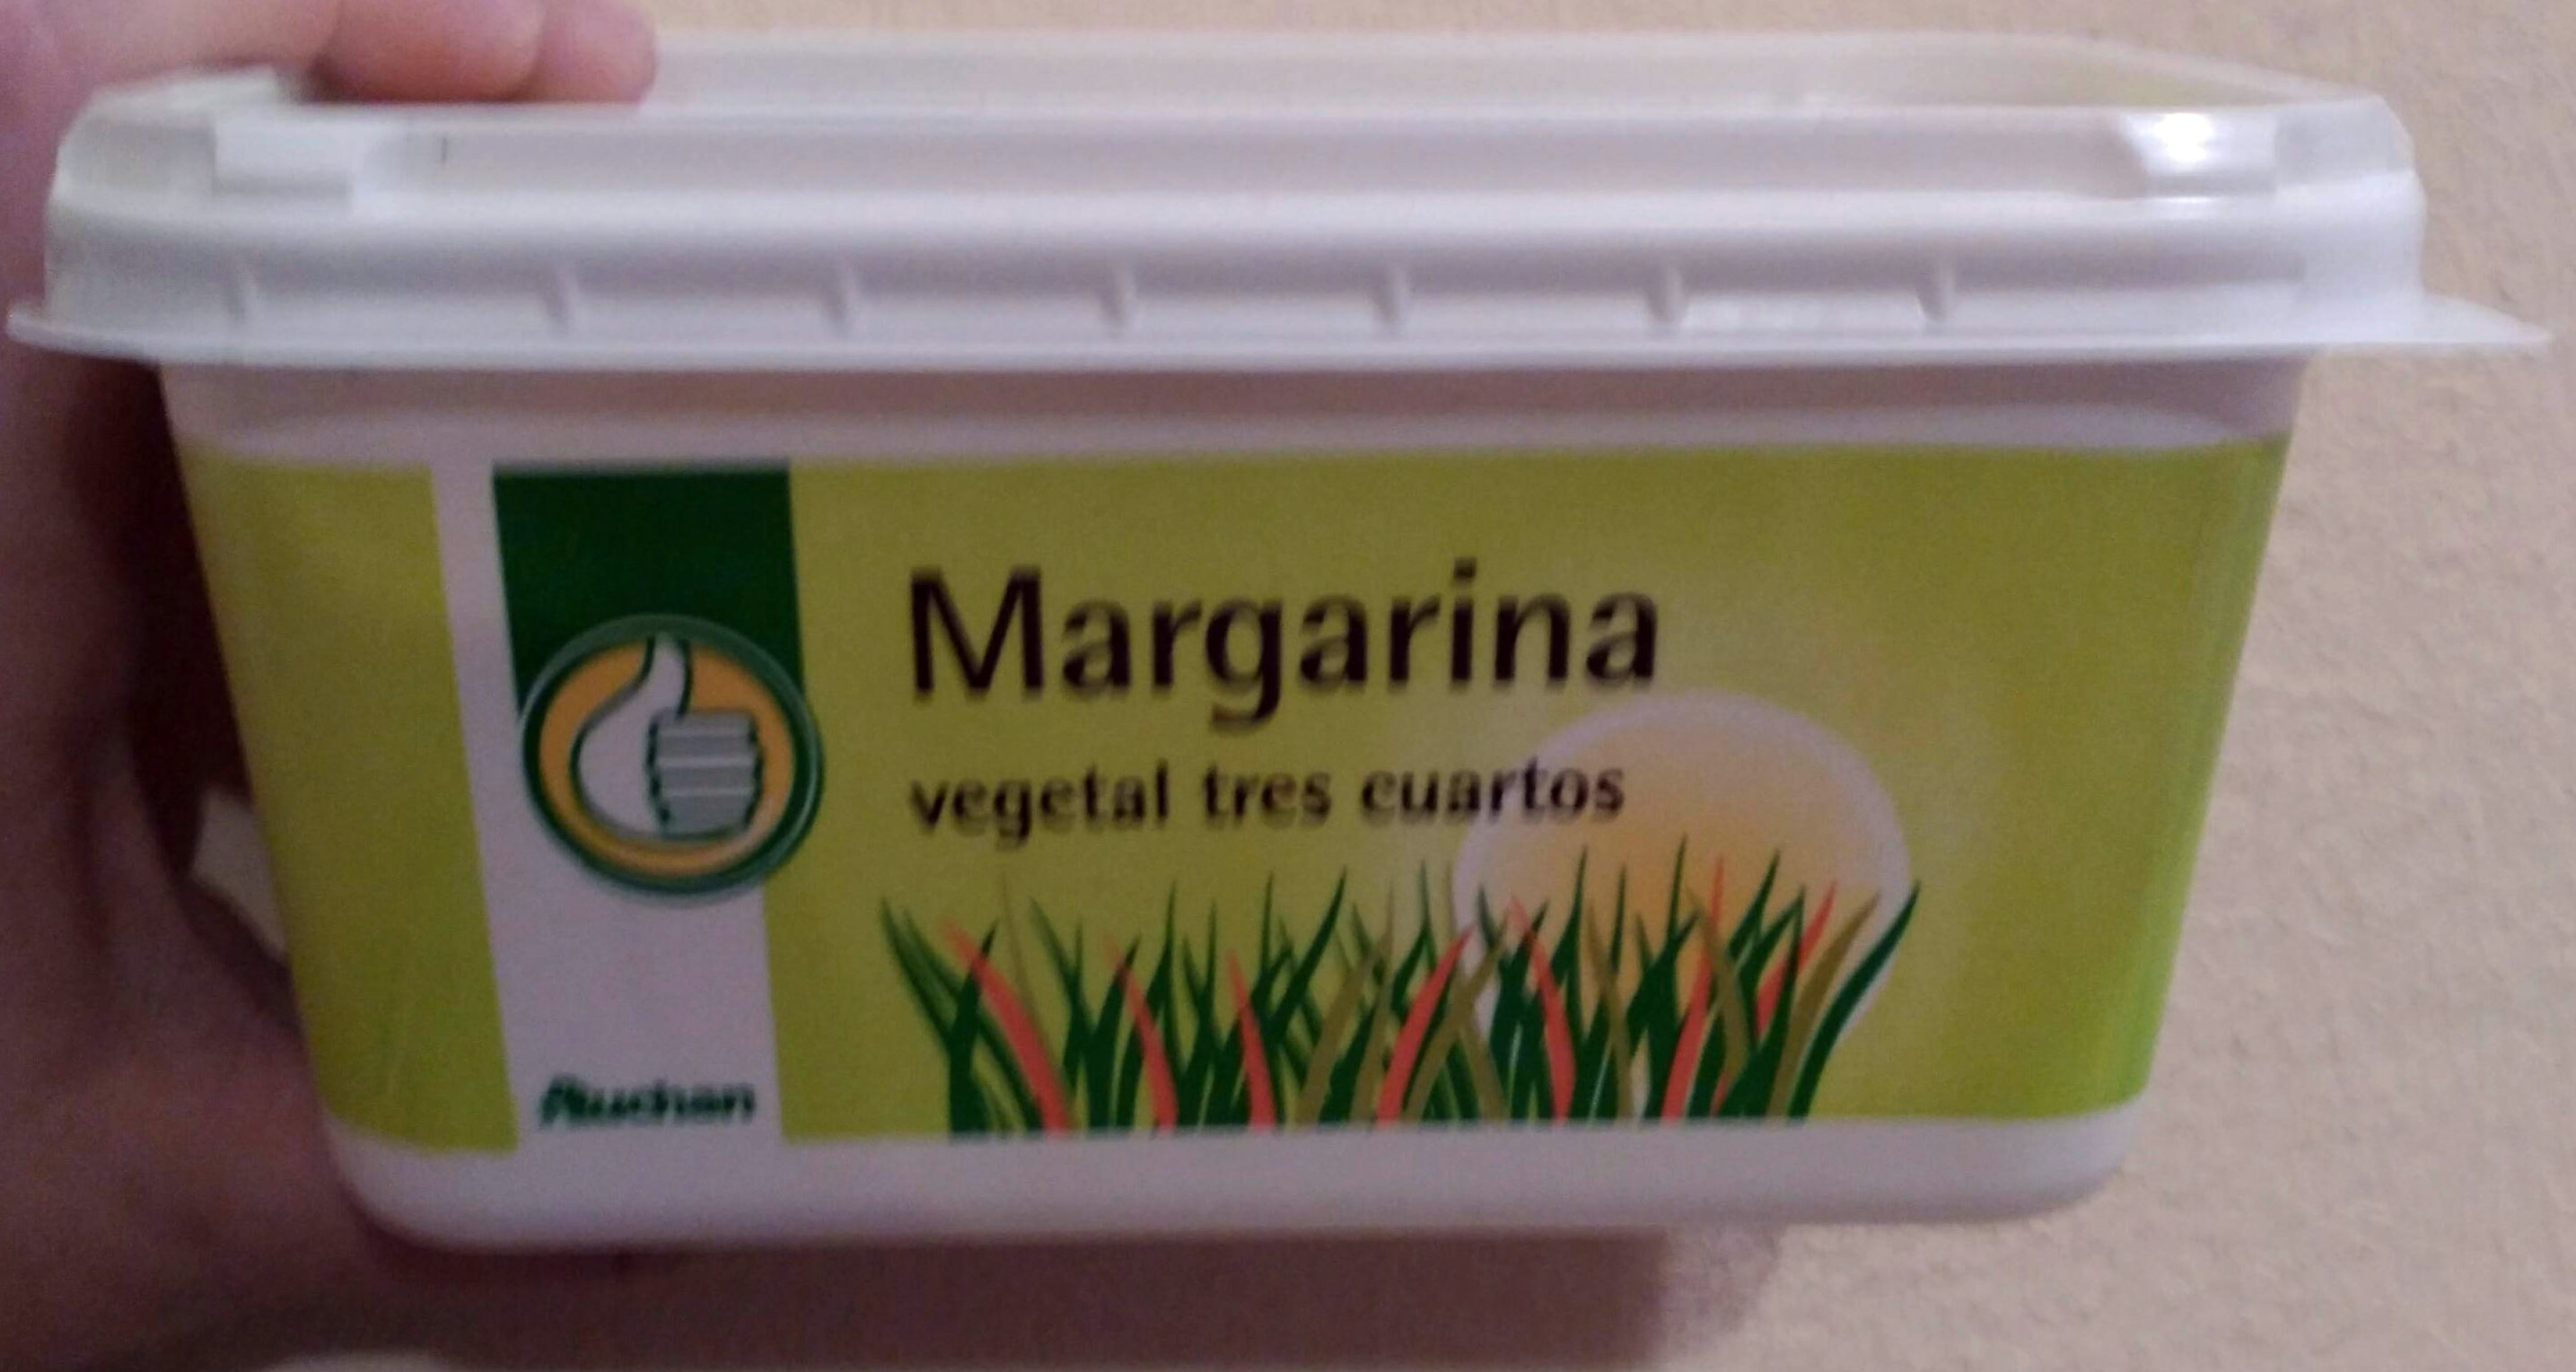 Margarina vegetal tres cuartos - Produit